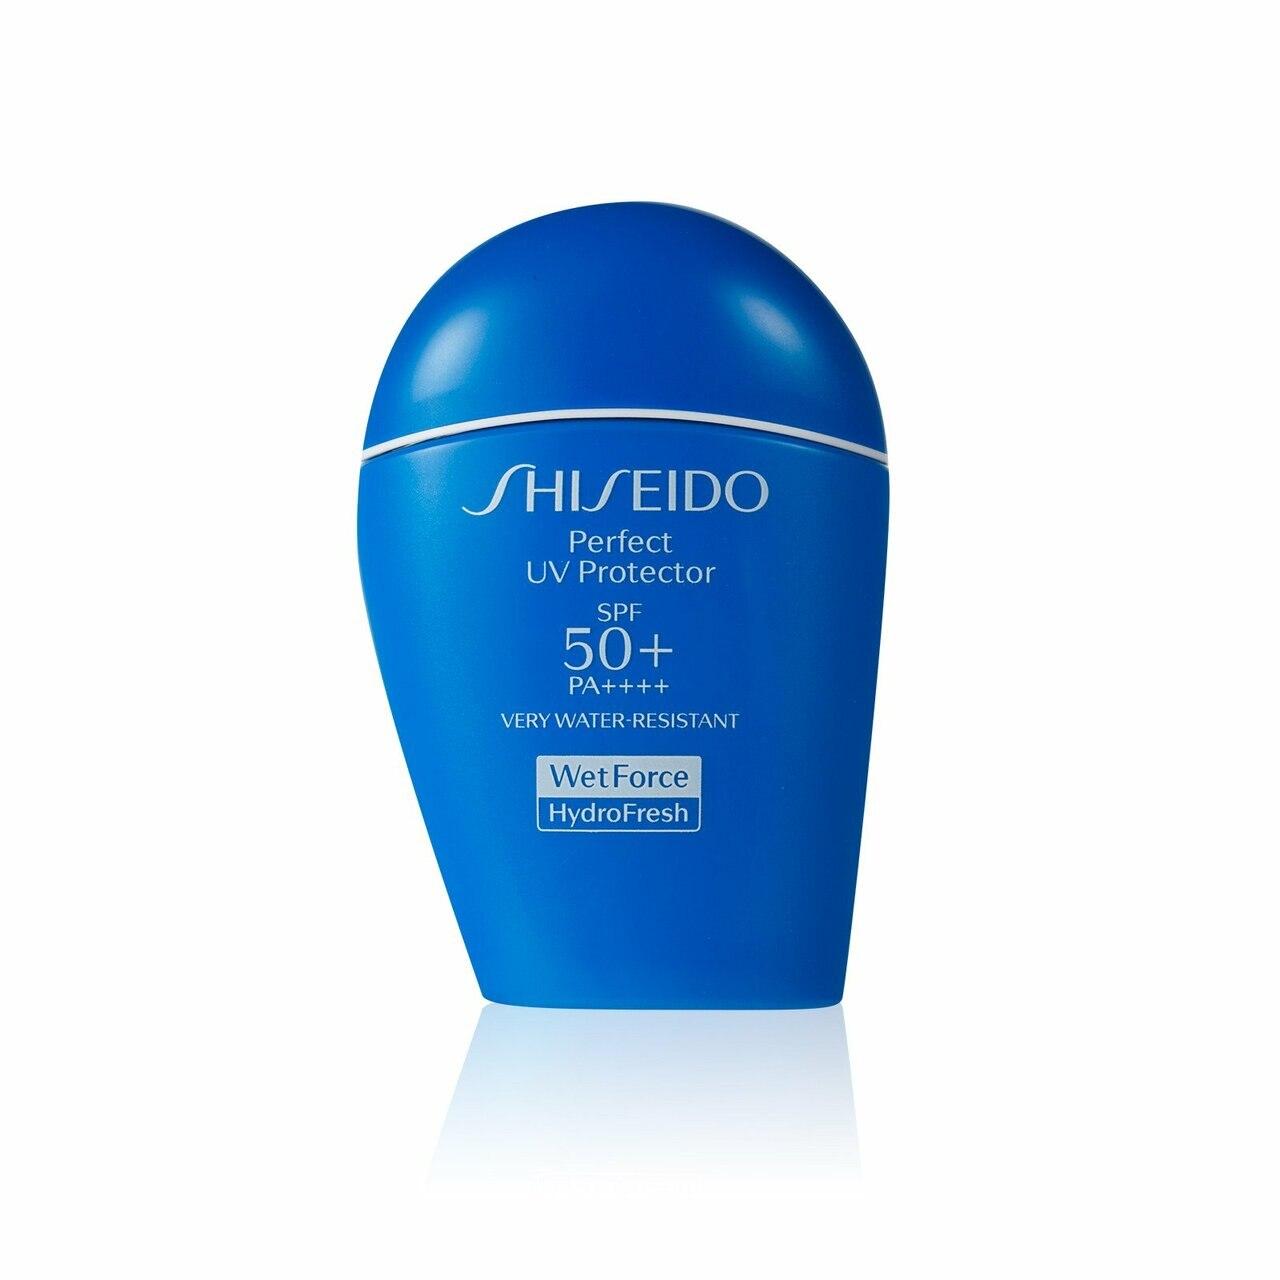 Shiseido Perfect UV Protector H SPF50+ PA++++ (Hydrofresh)